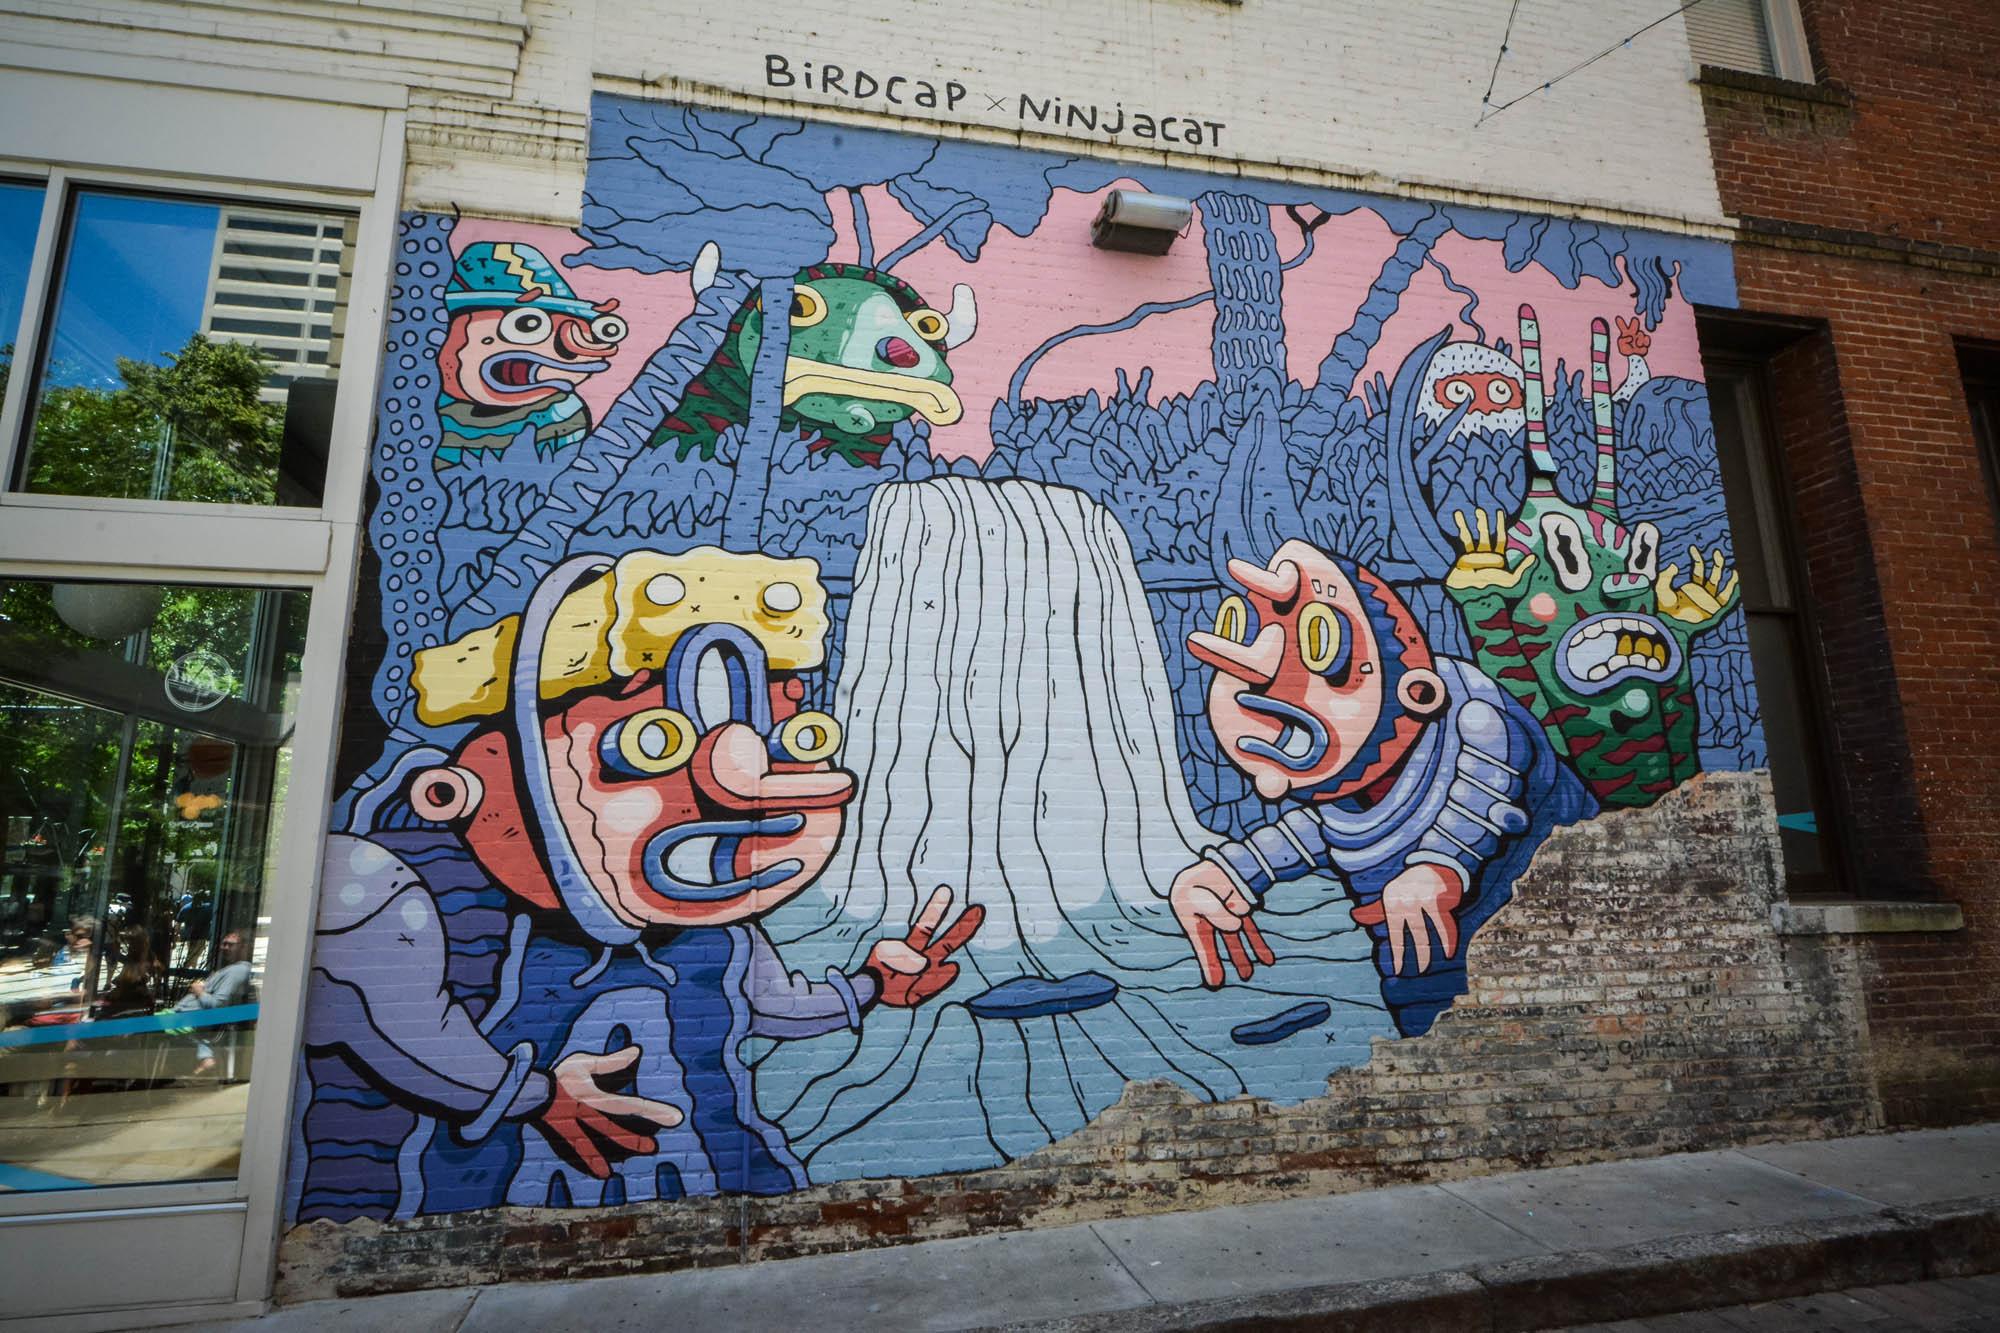 Light Mural by Birdcap and Ninjacat in downtown Memphis, TN